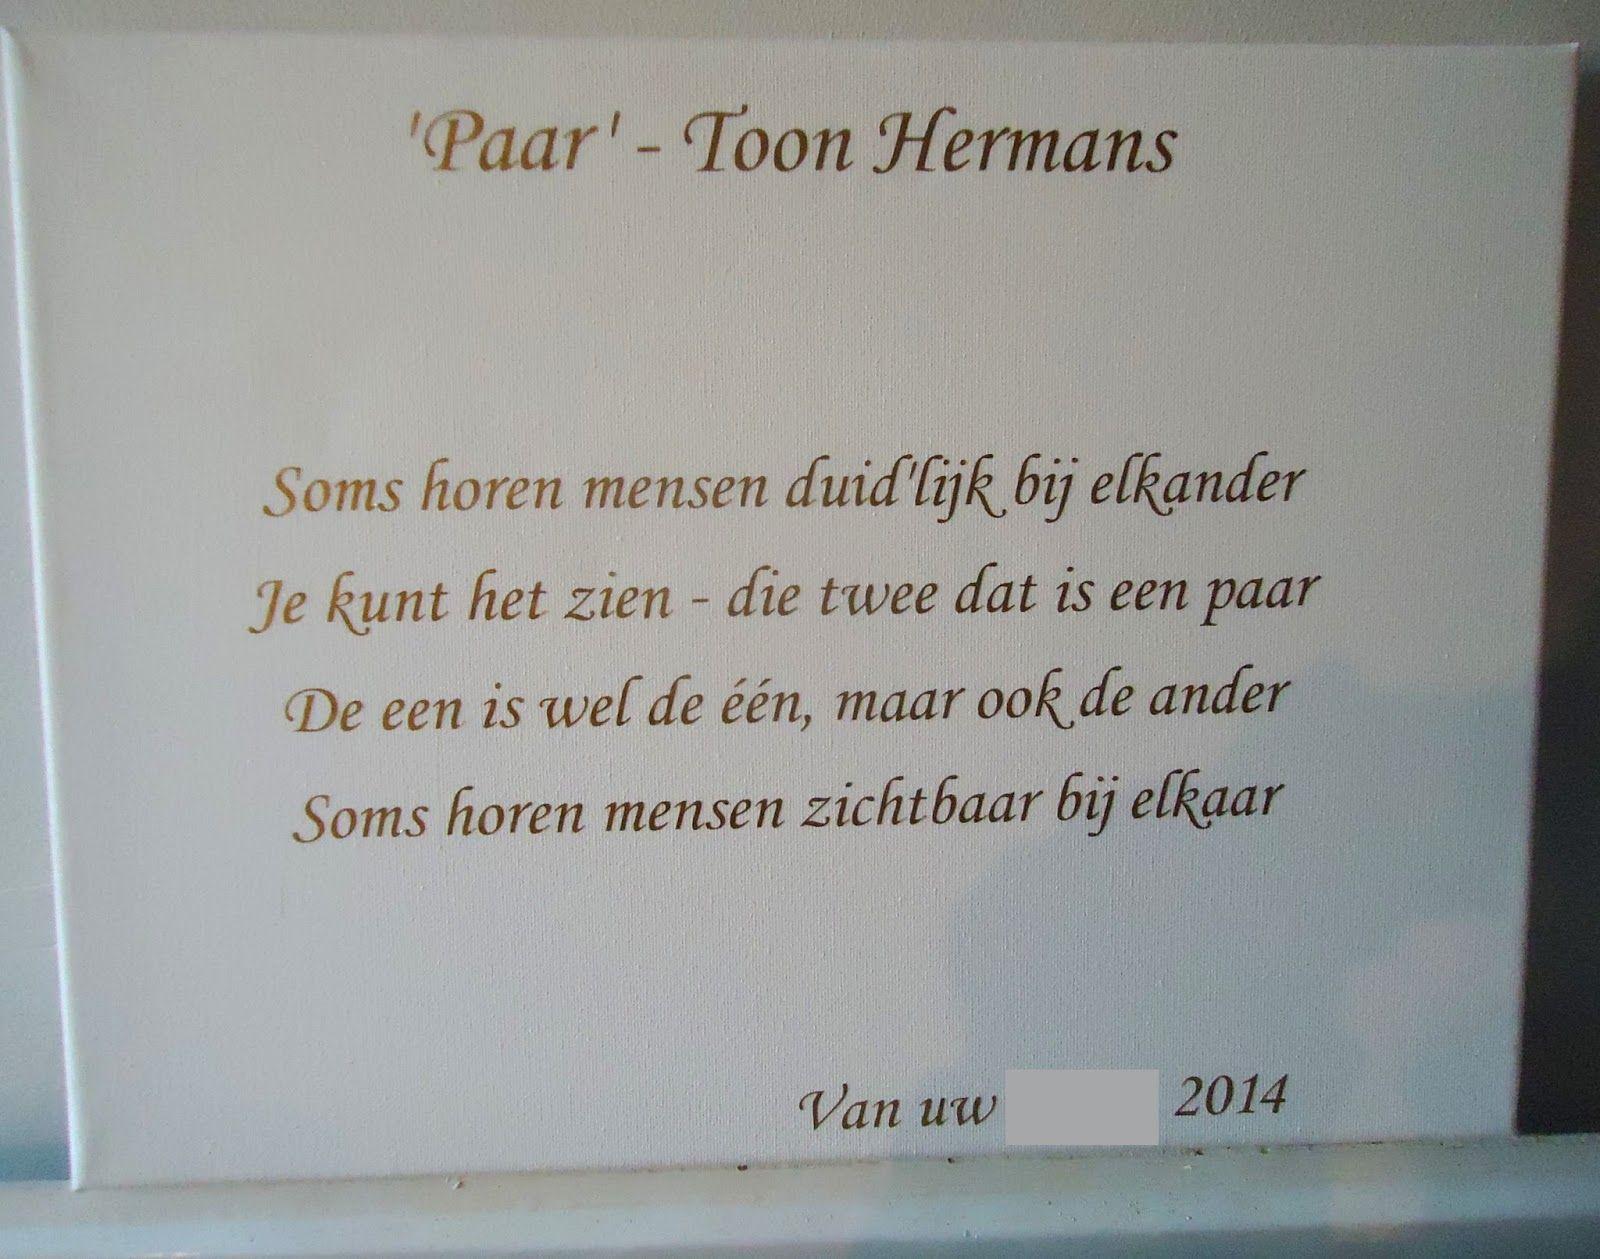 gedicht 50 jaar getrouwd toon hermans Gedichtjes Huwelijk Toon Hermans   ARCHIDEV gedicht 50 jaar getrouwd toon hermans